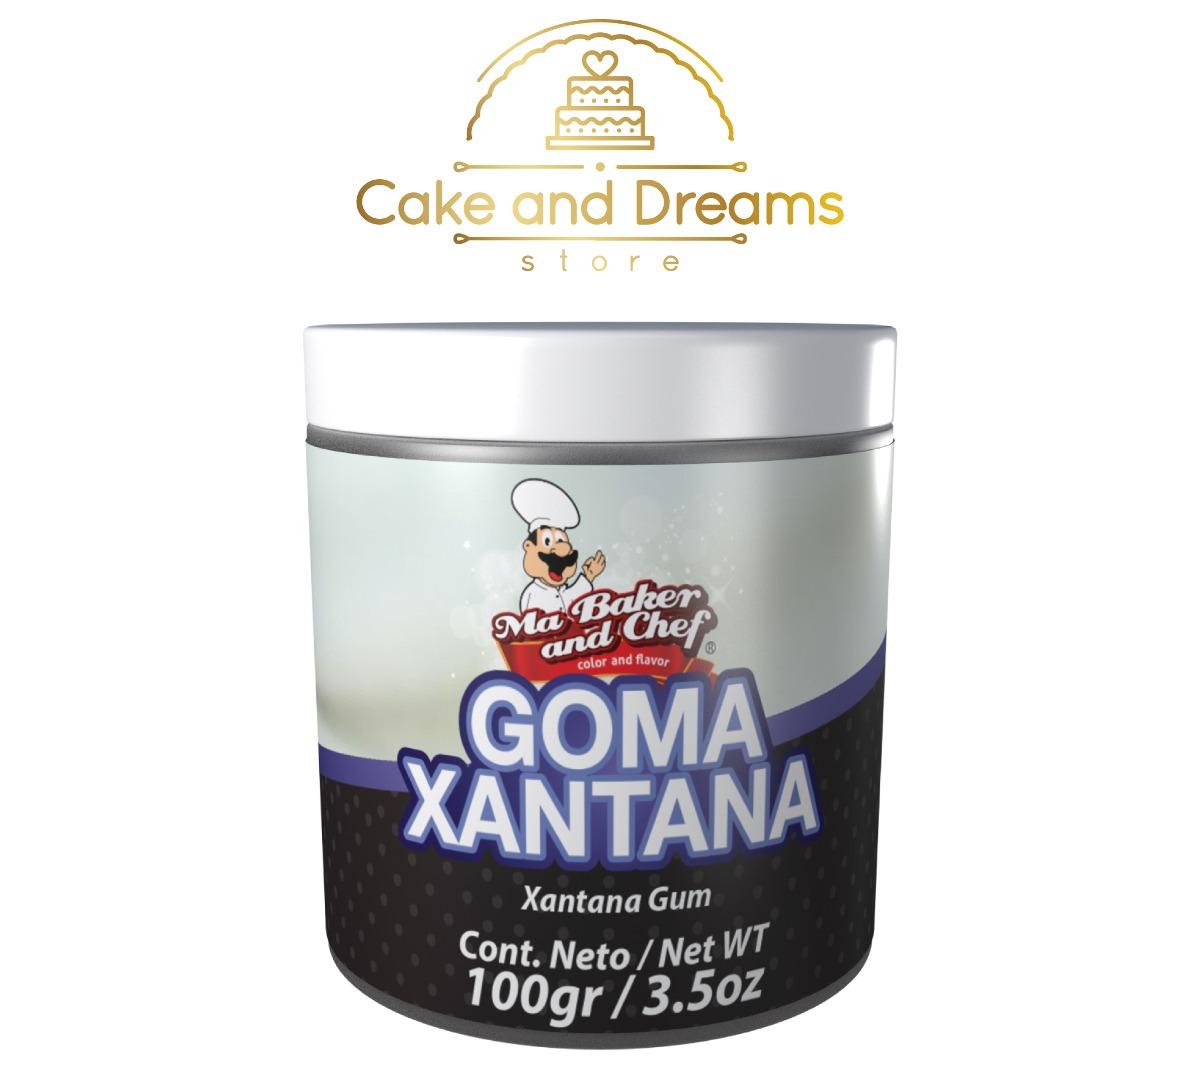 Goma Xantana 100g - Ma Baker and Chef